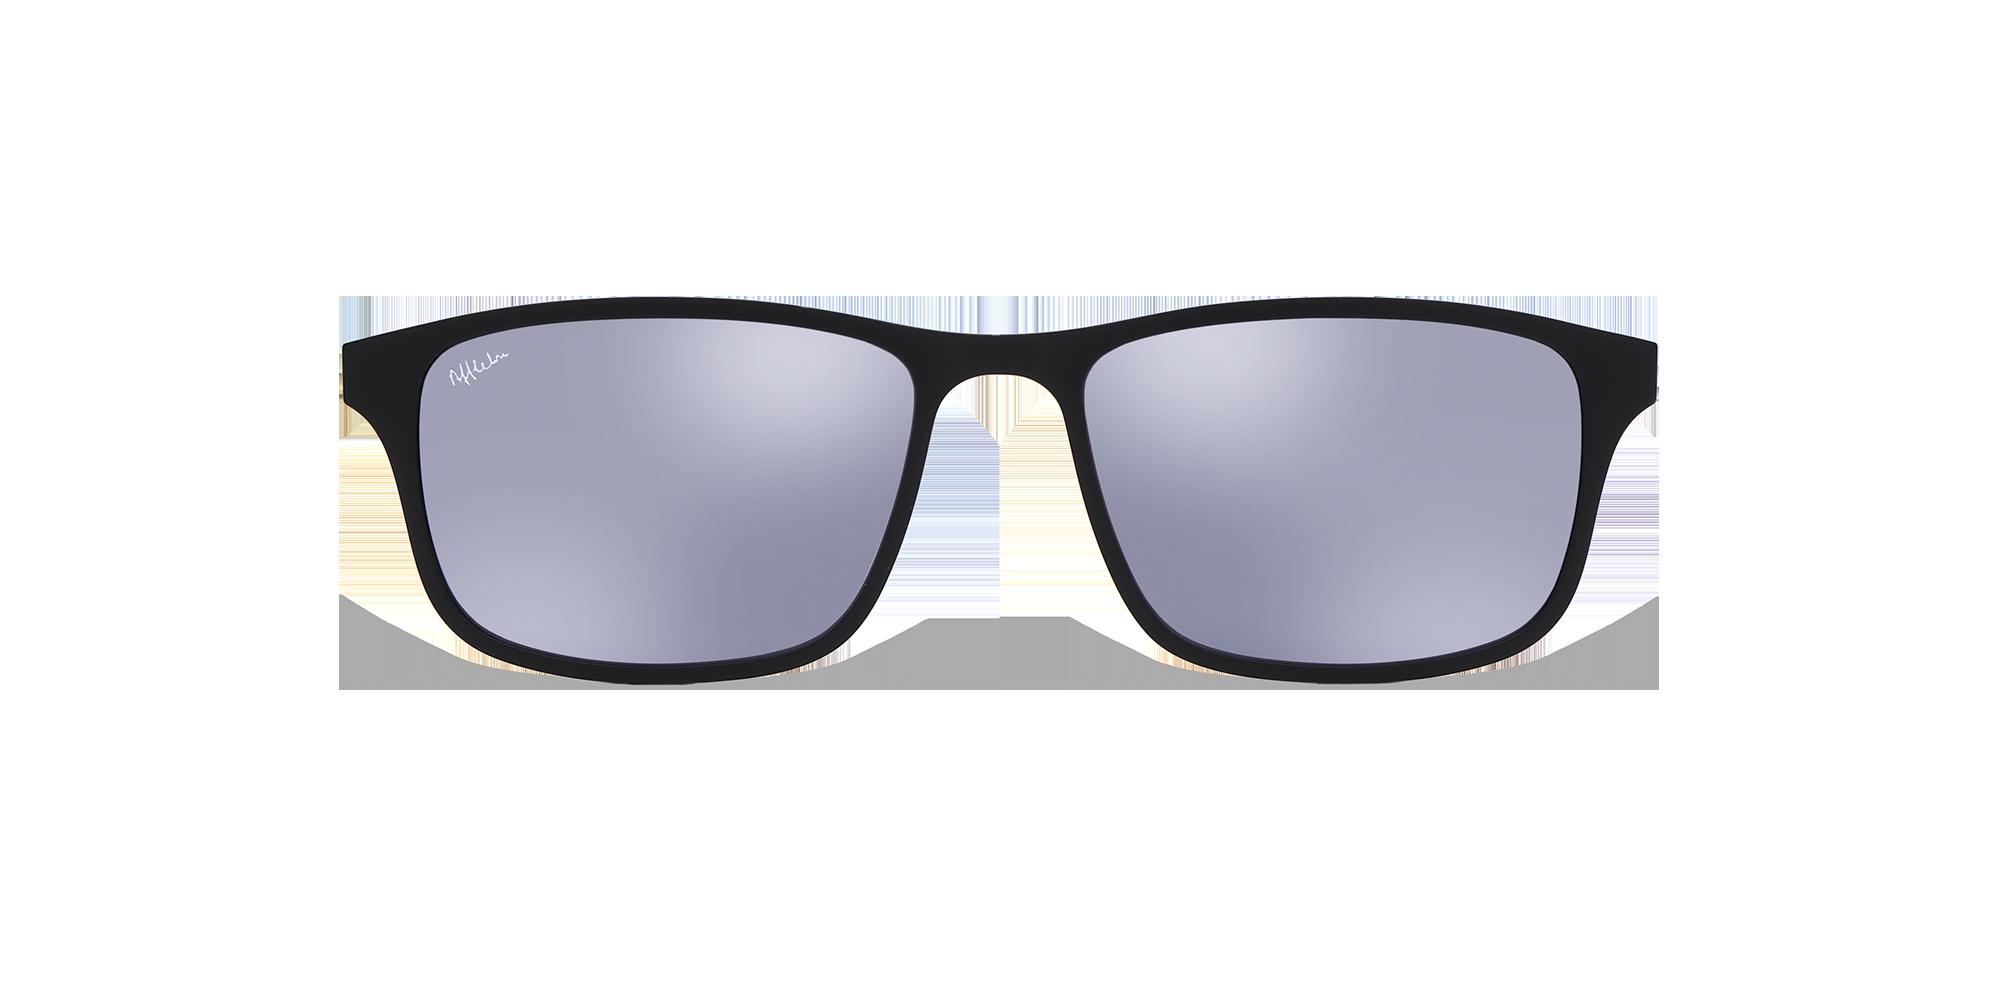 afflelou/france/products/smart_clip/clips_glasses/TMK41S4BK015416.png